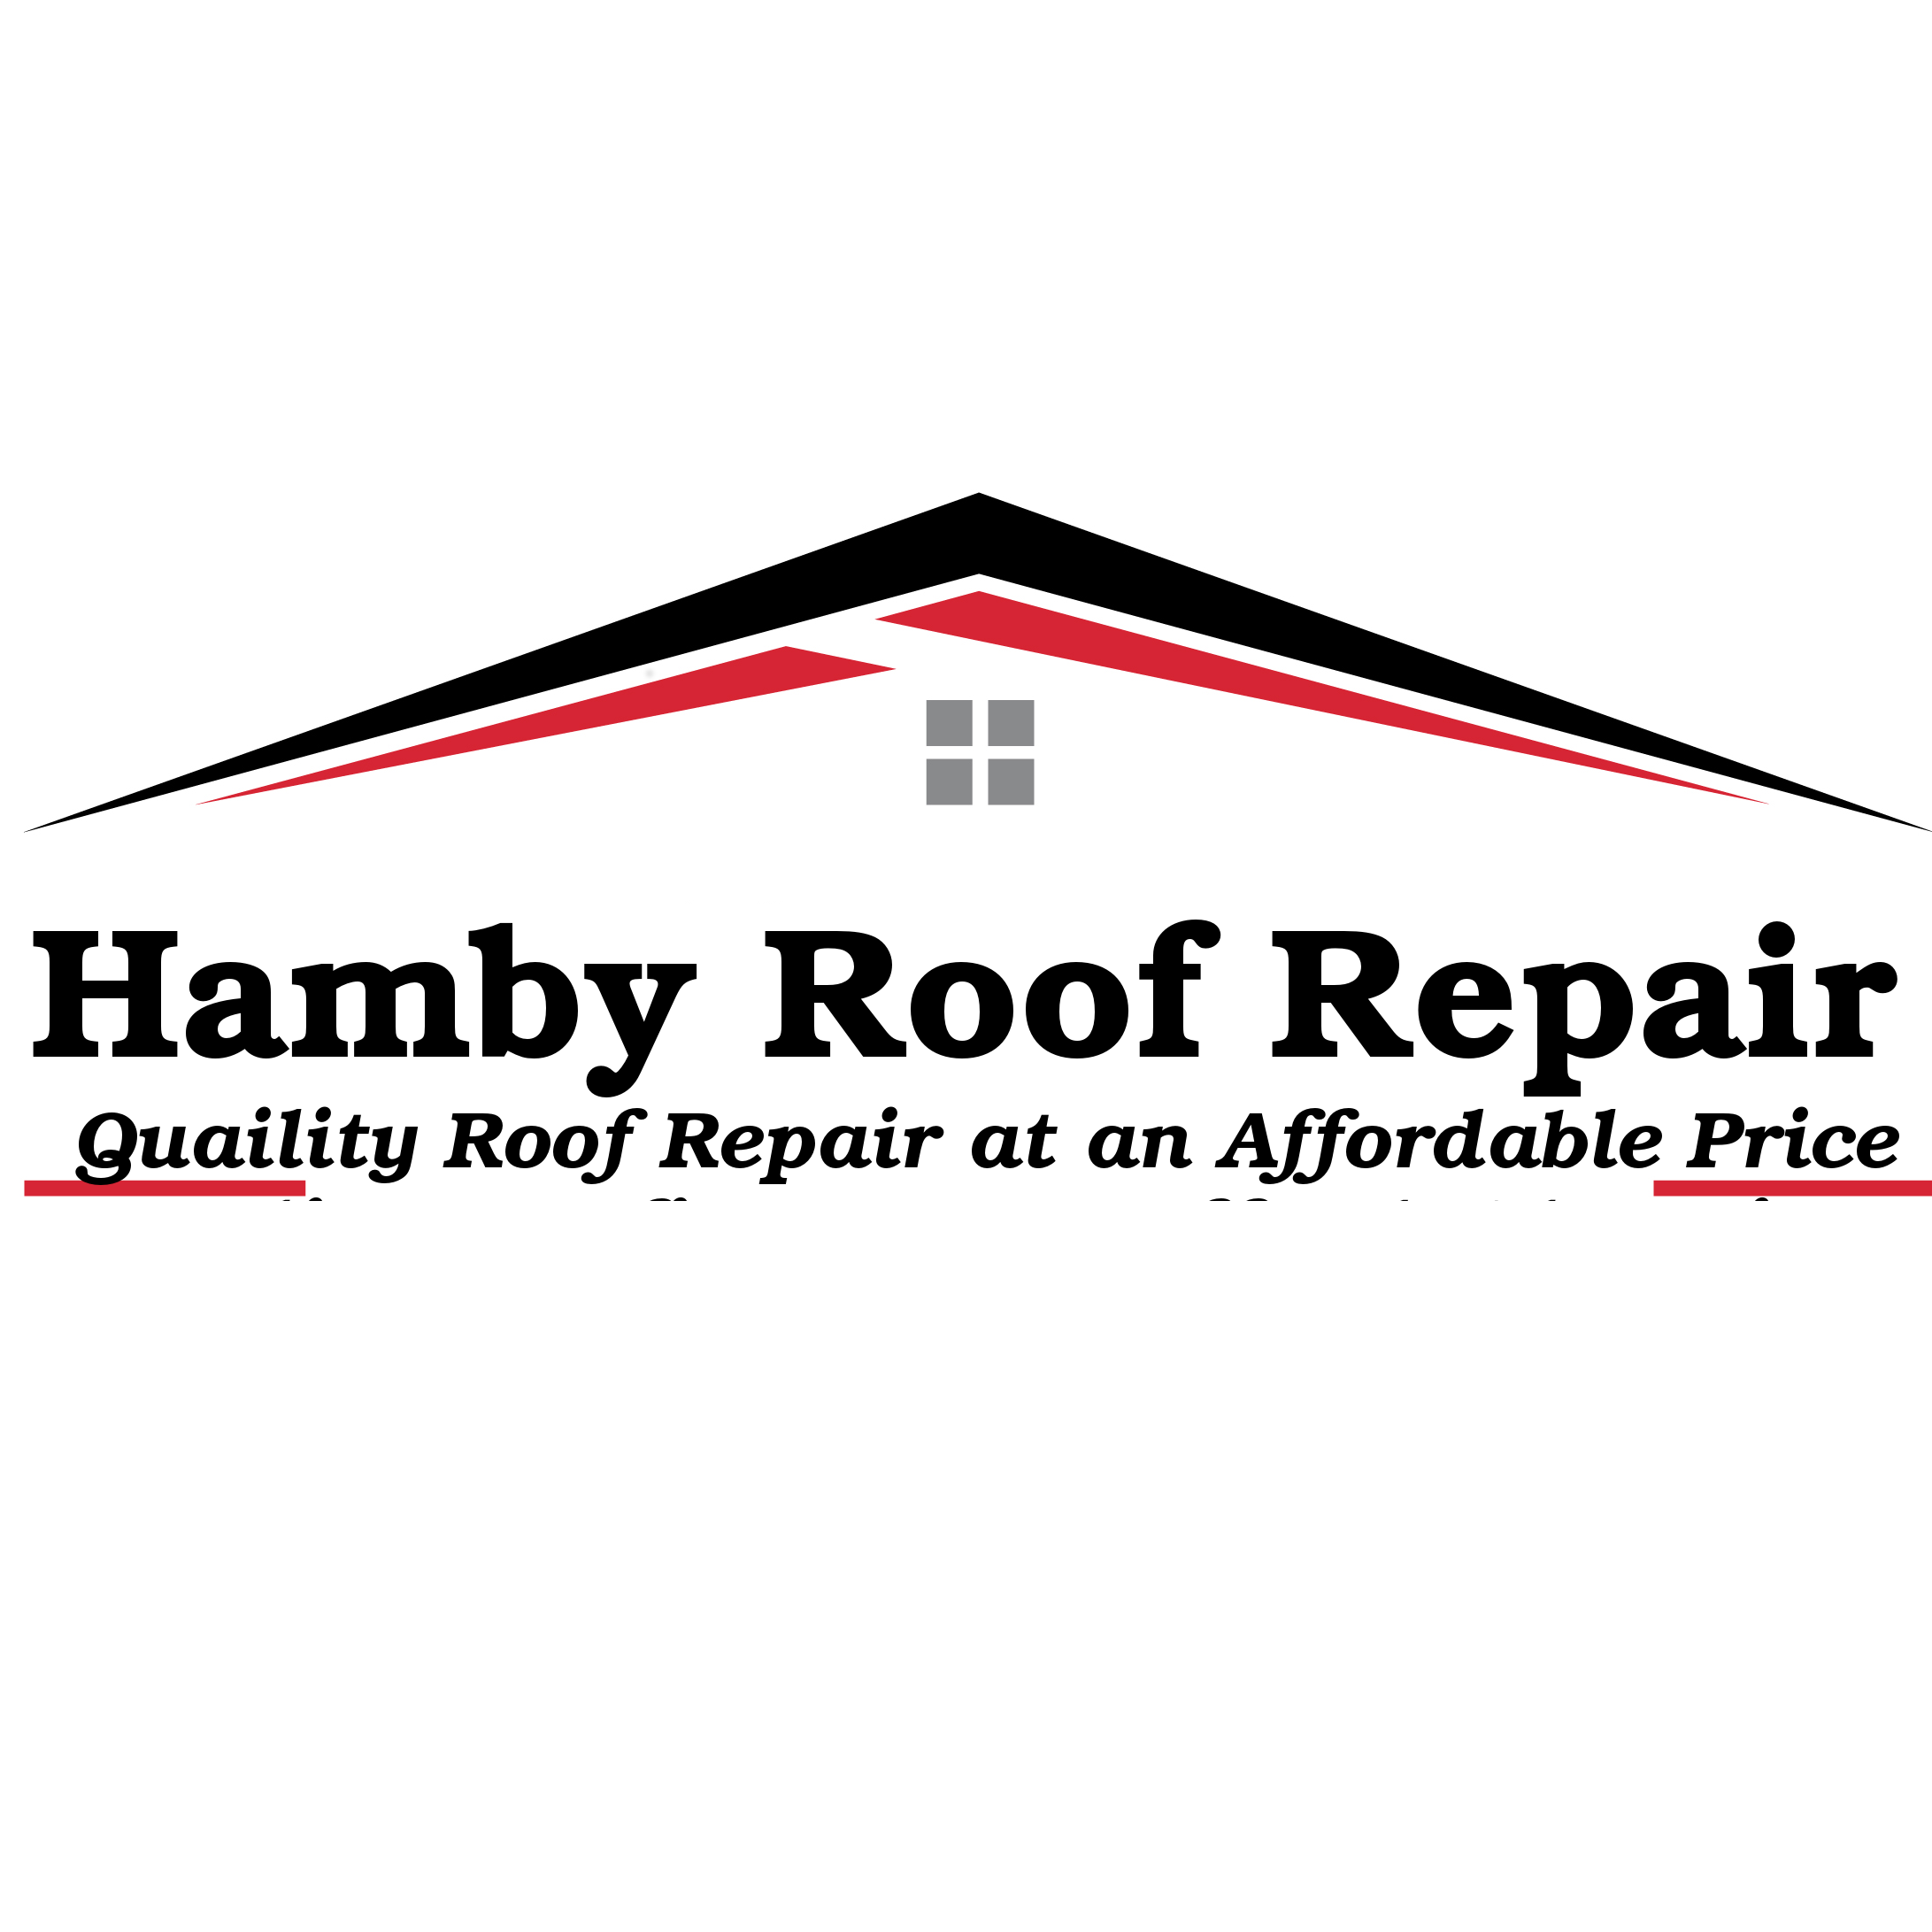 Hamby Roof Repair image 4